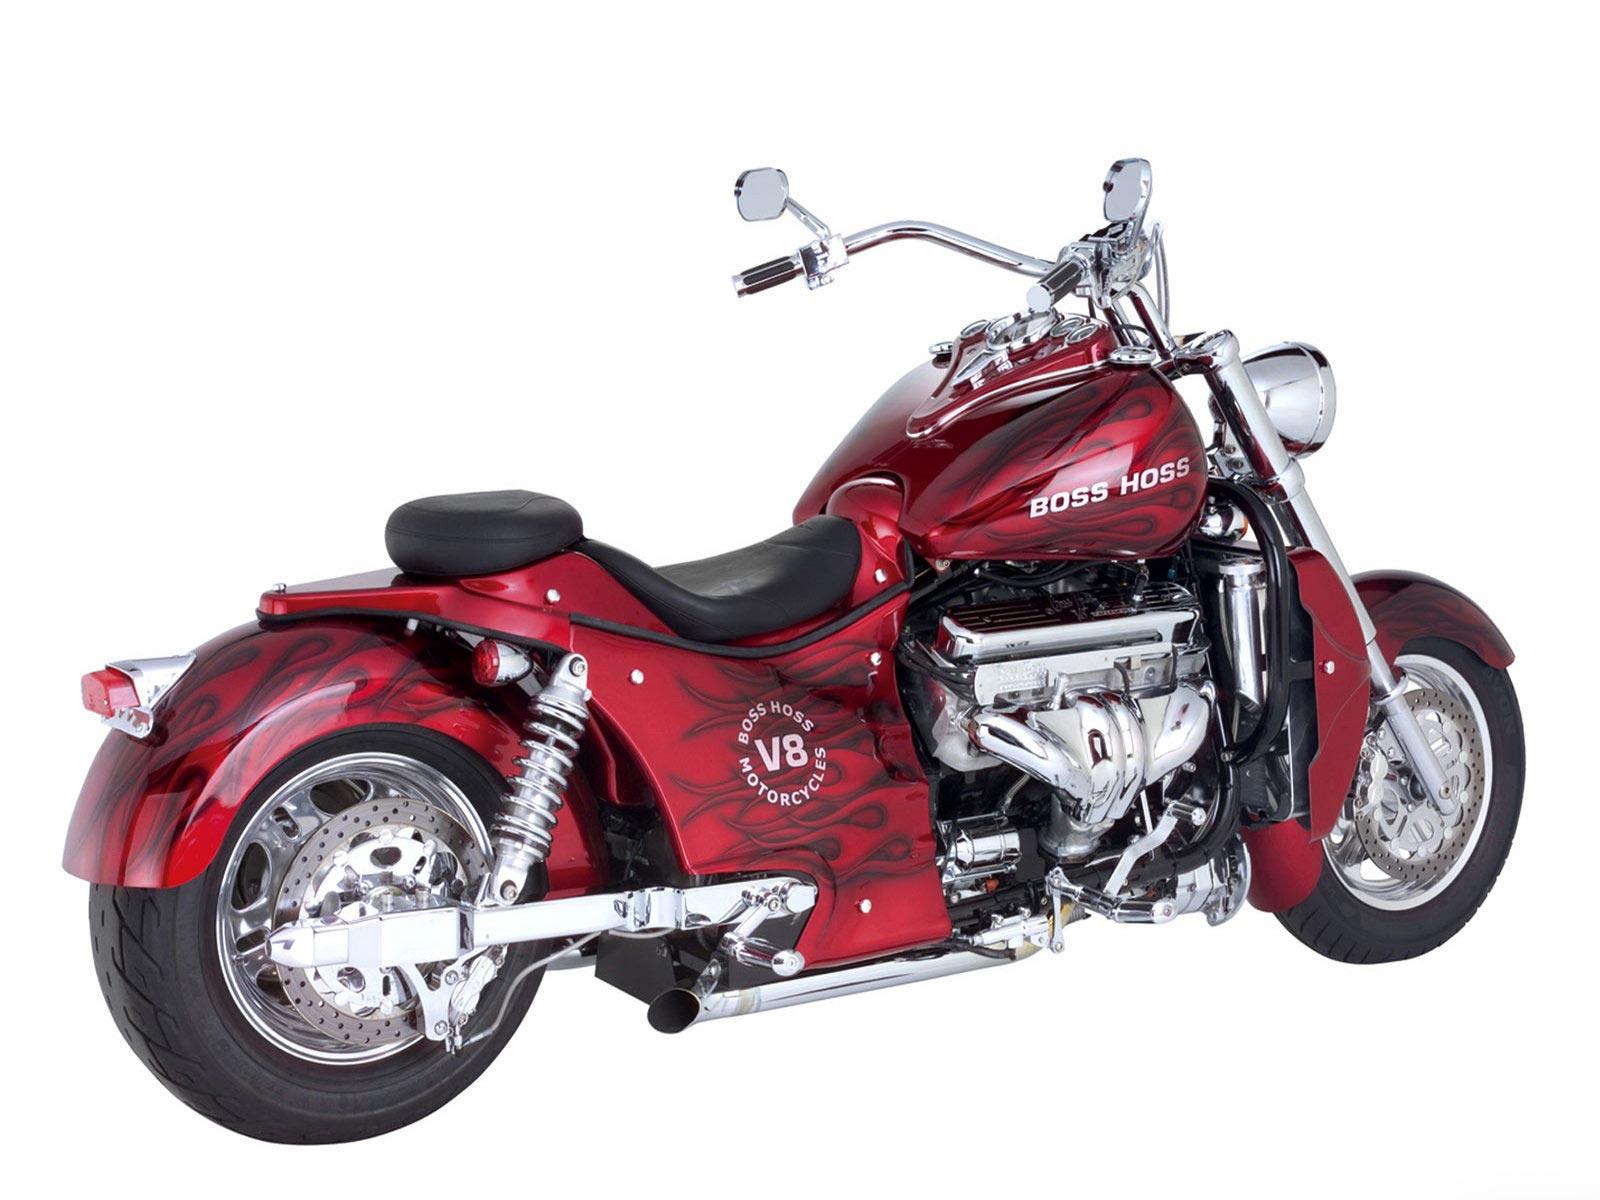 motorcycle company Desktop High Quality WallpapersWallpaper Desktop 1600x1200